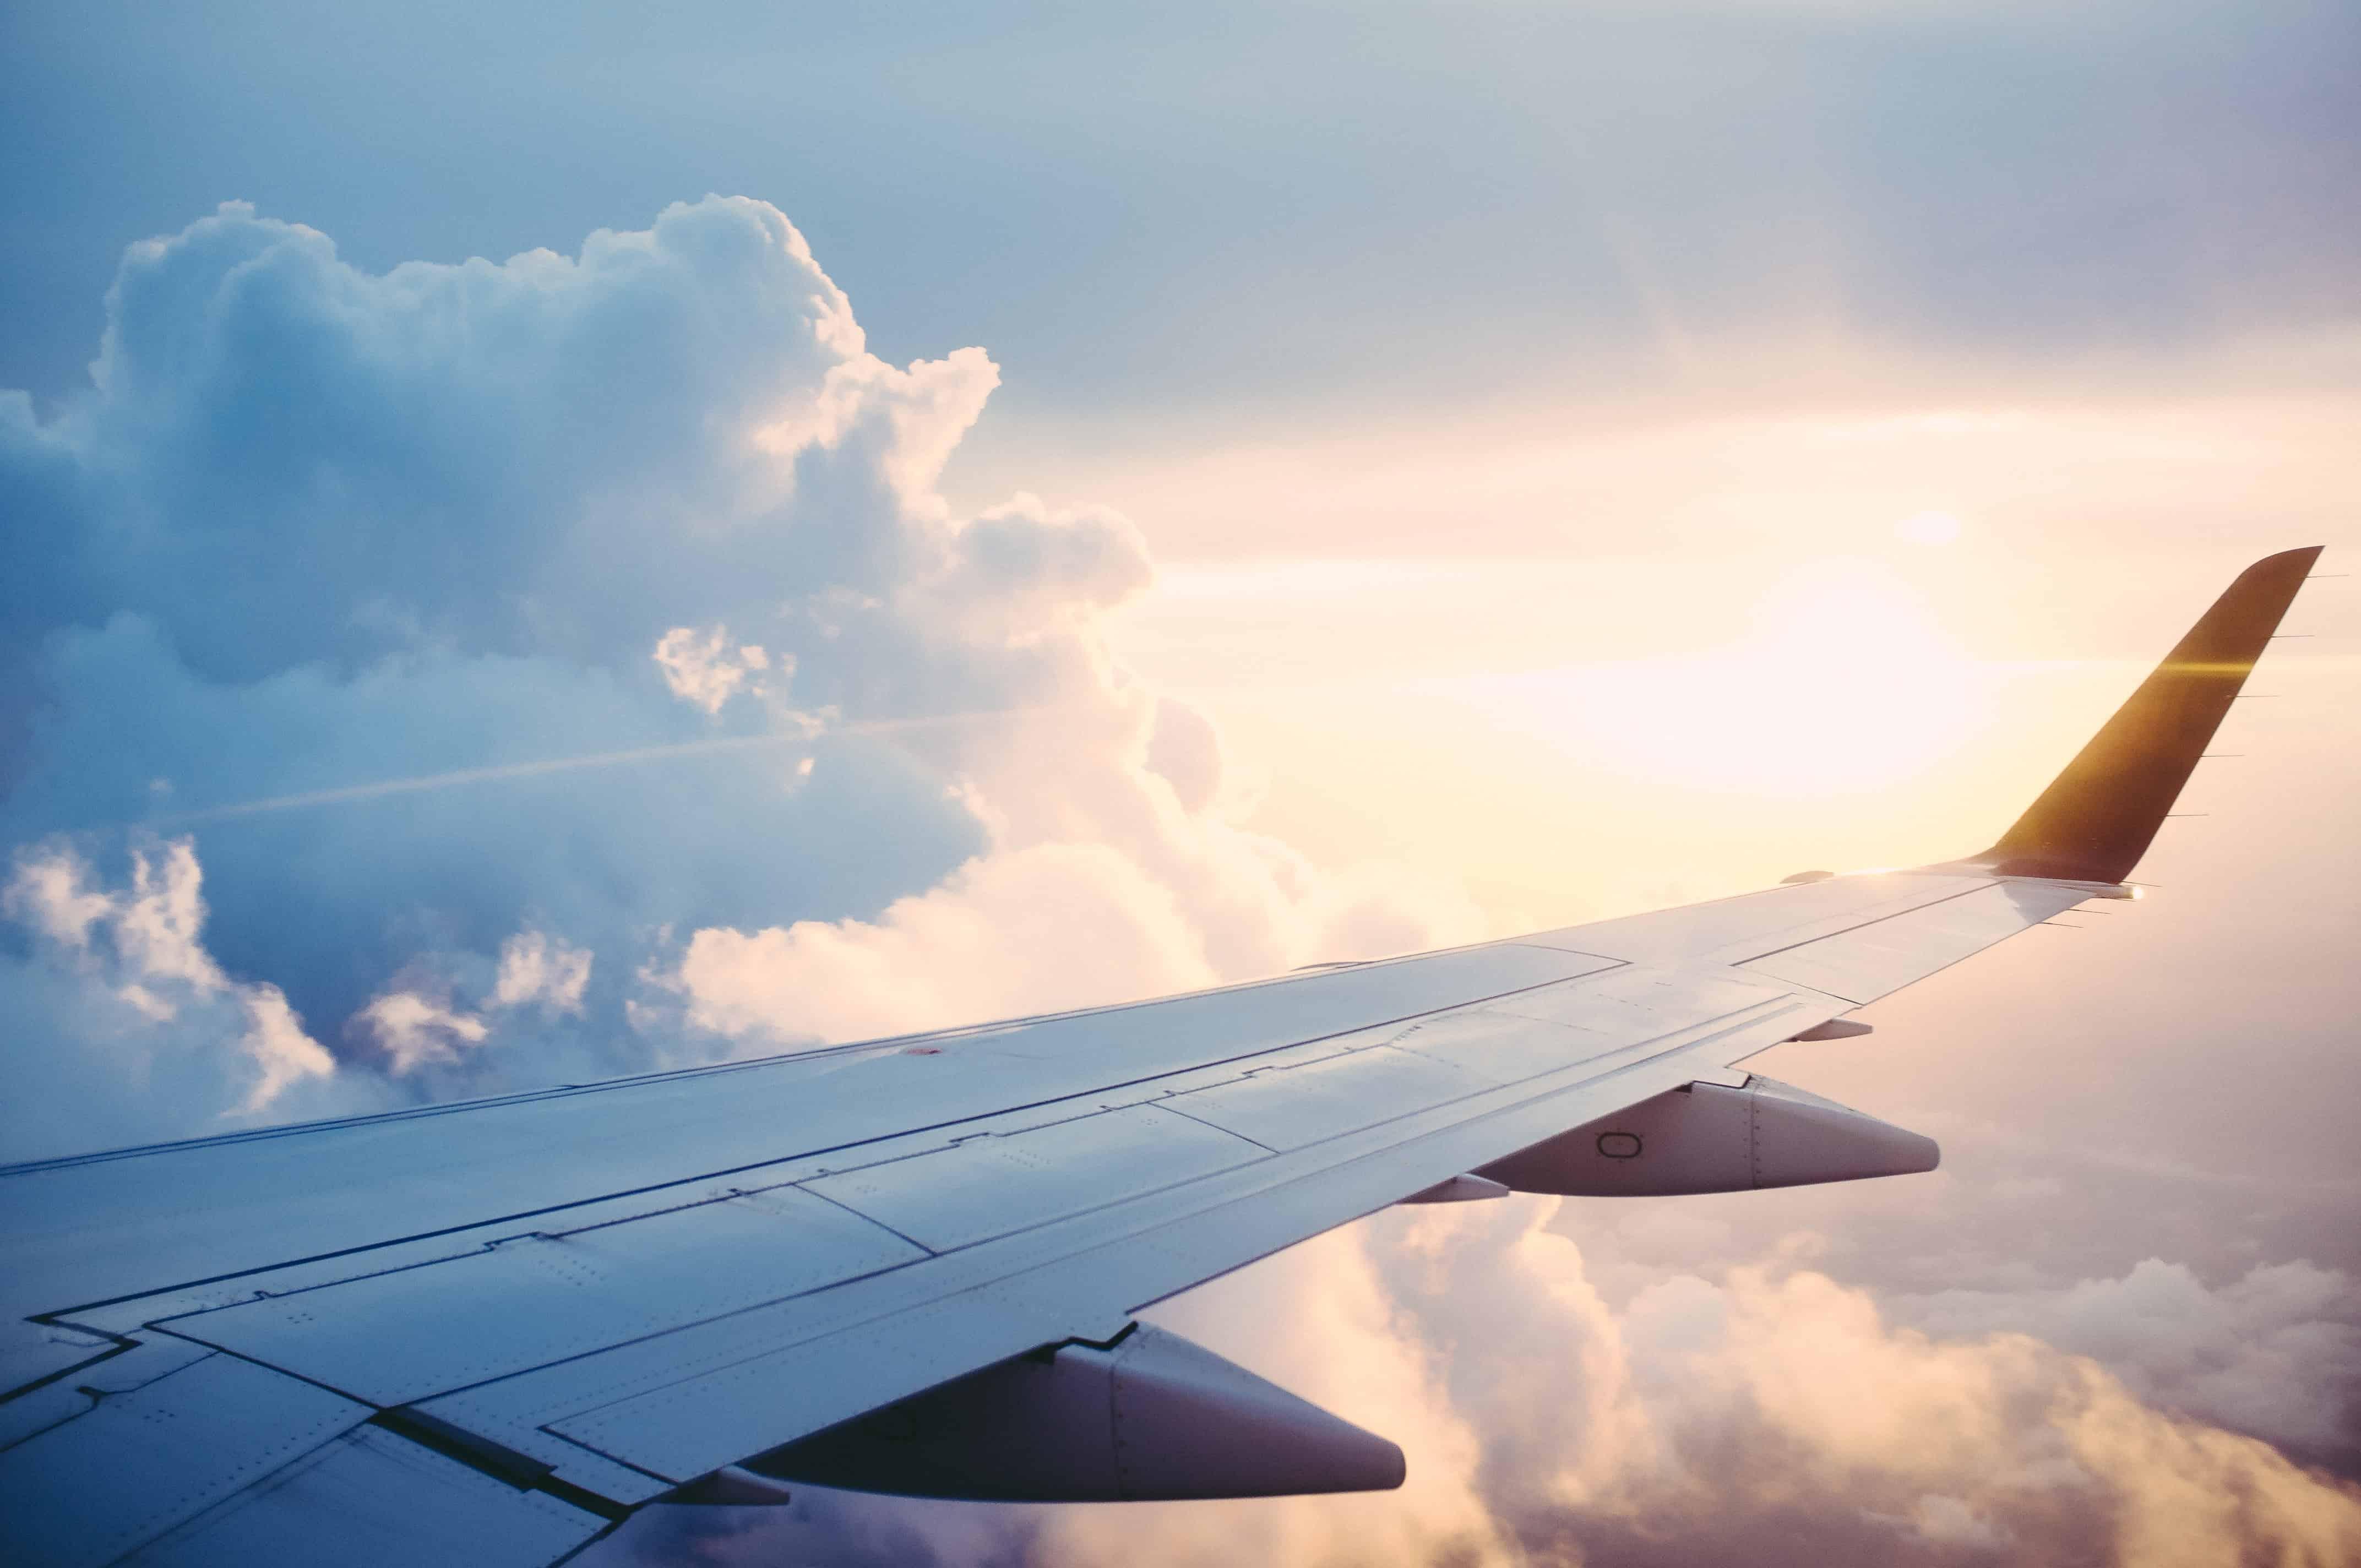 flight deals from Australia to Ireland